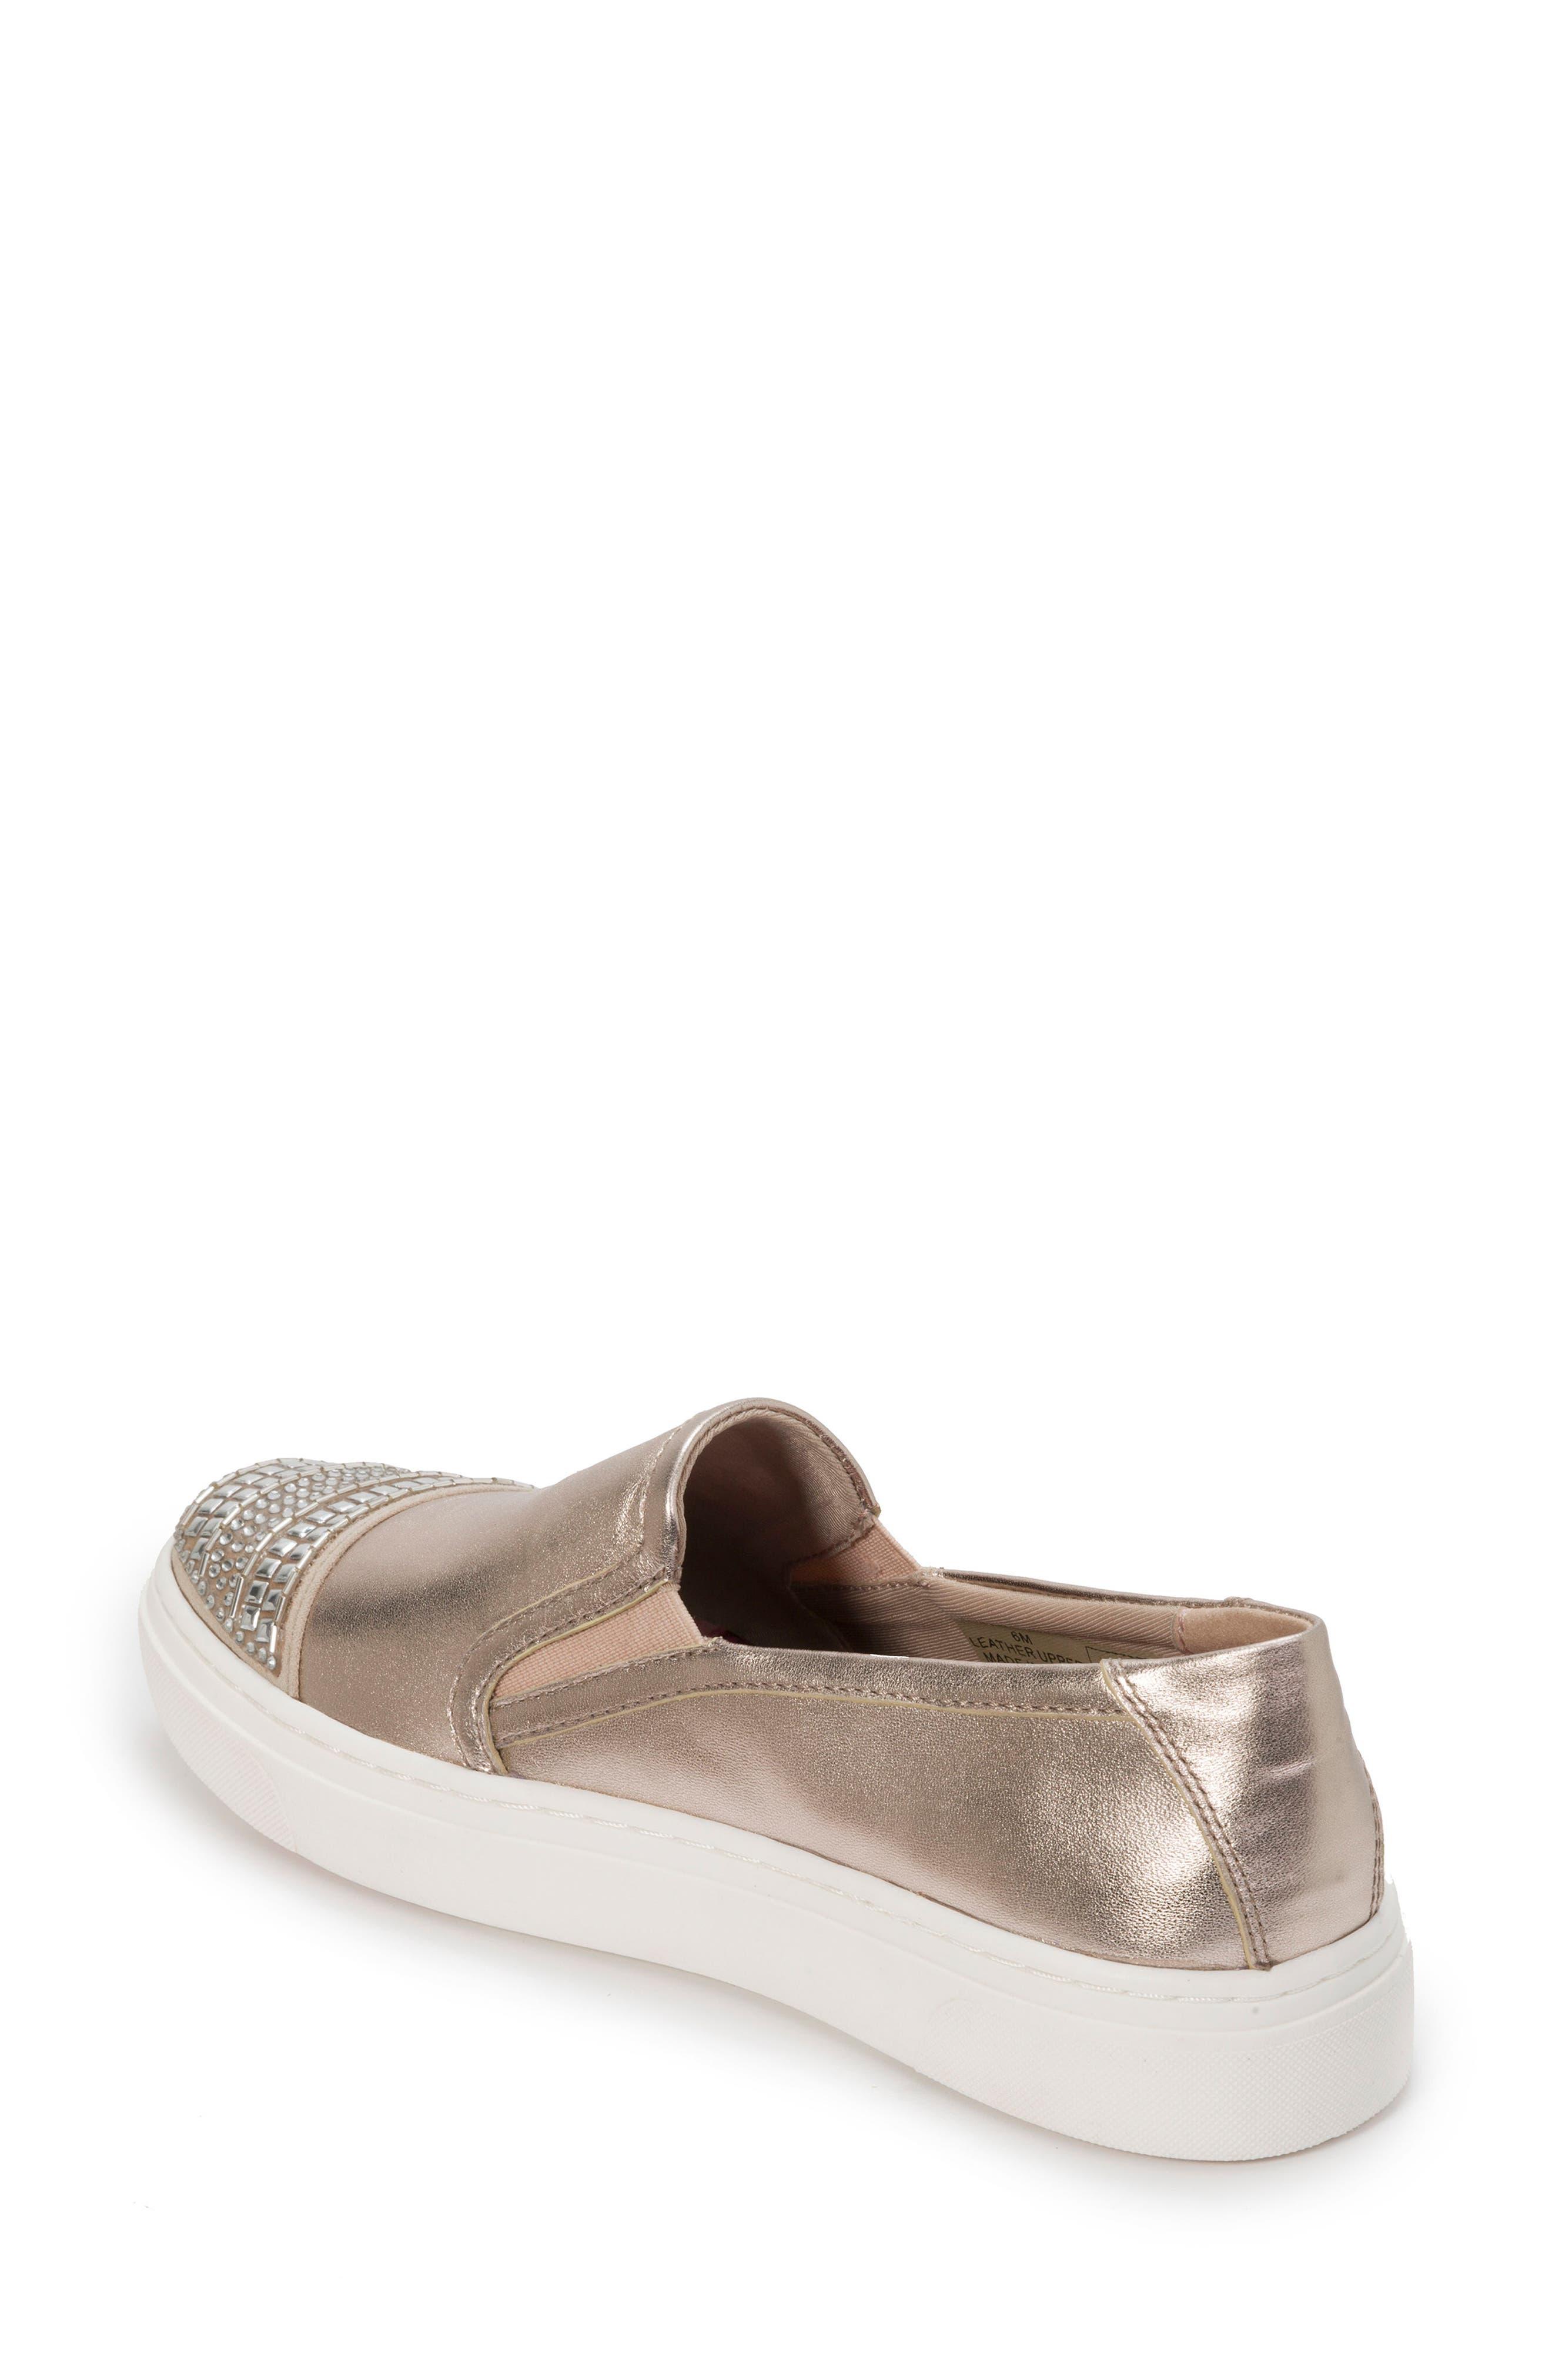 24e8f789ee4 Women s Shoes Sale